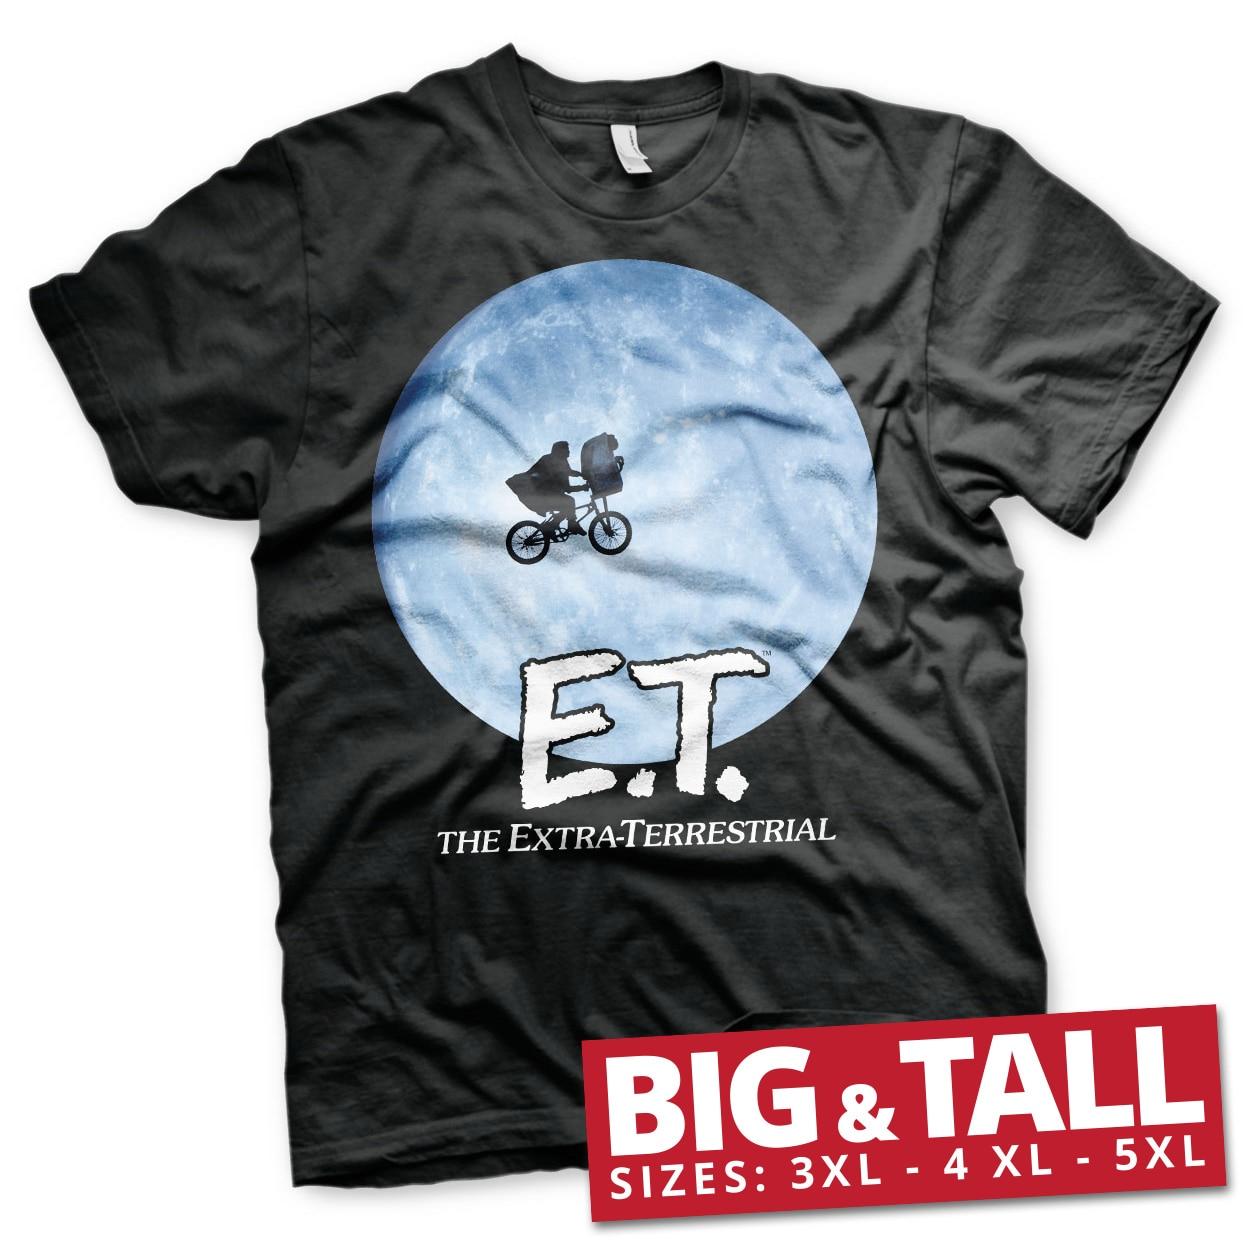 E.T. Bike In The Moon Big & Tall T-Shirt